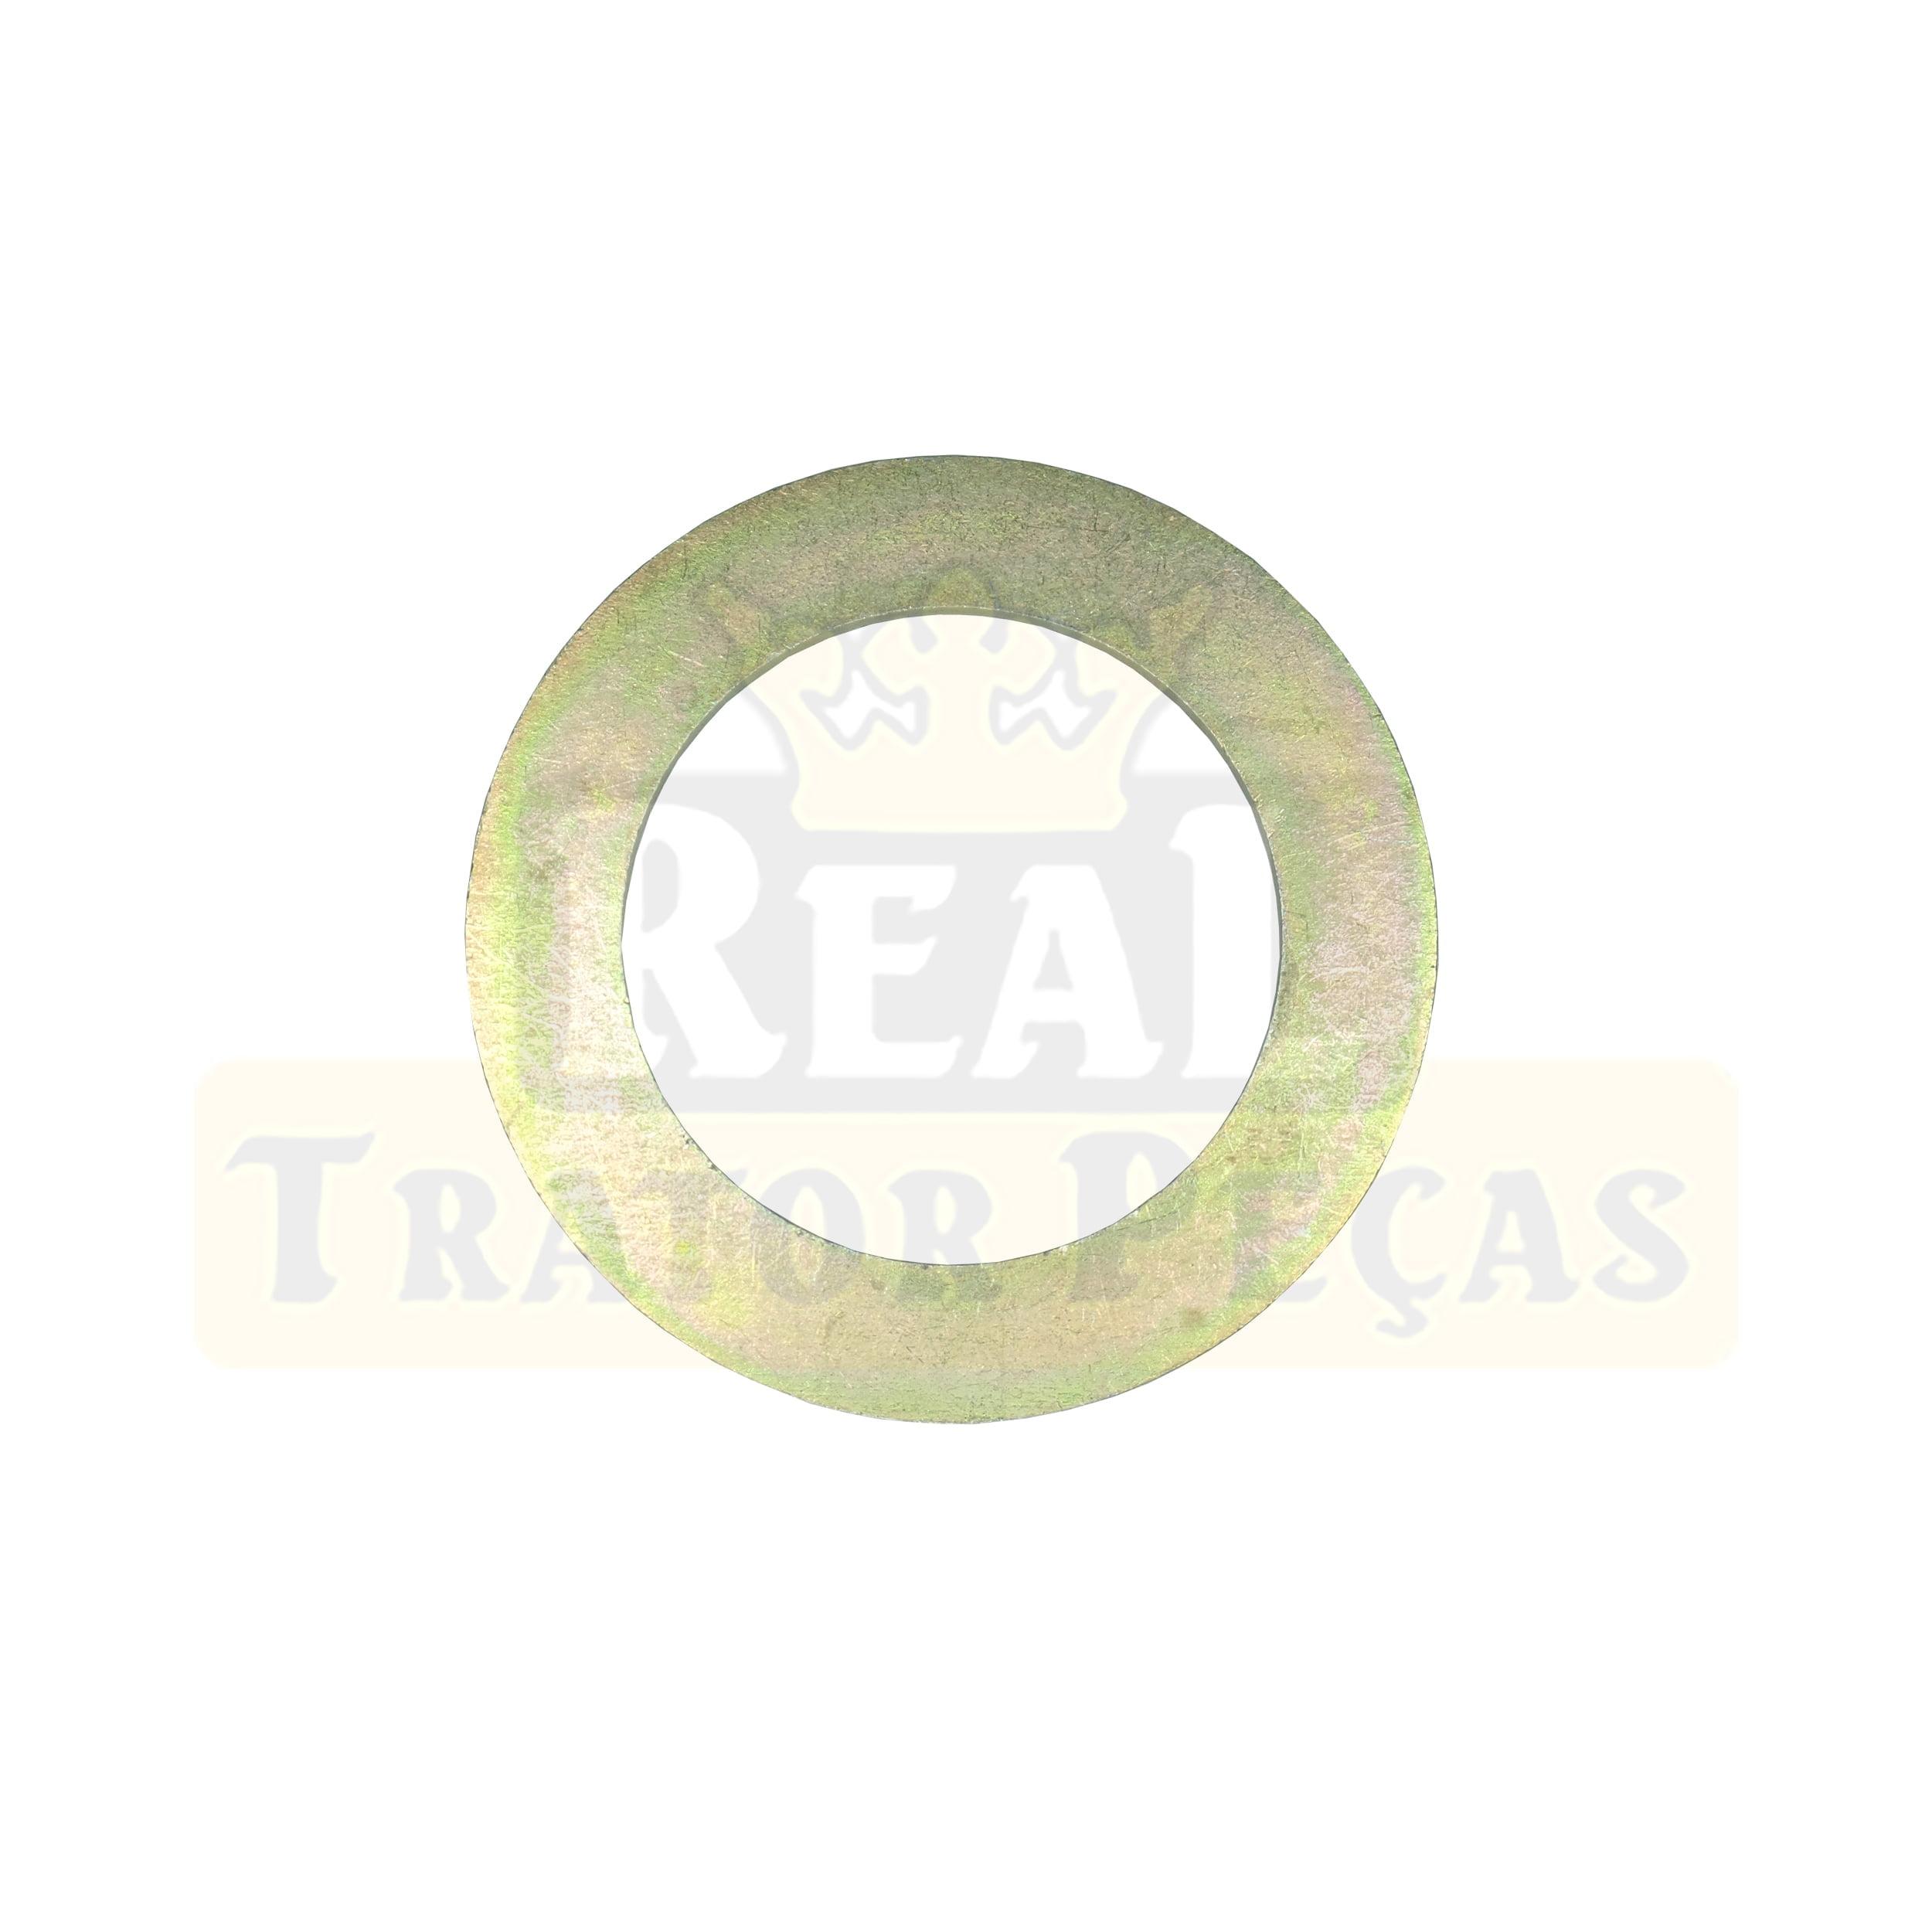 ARRUELA EMBUCHAMENTO - 85X65X3 - CASE